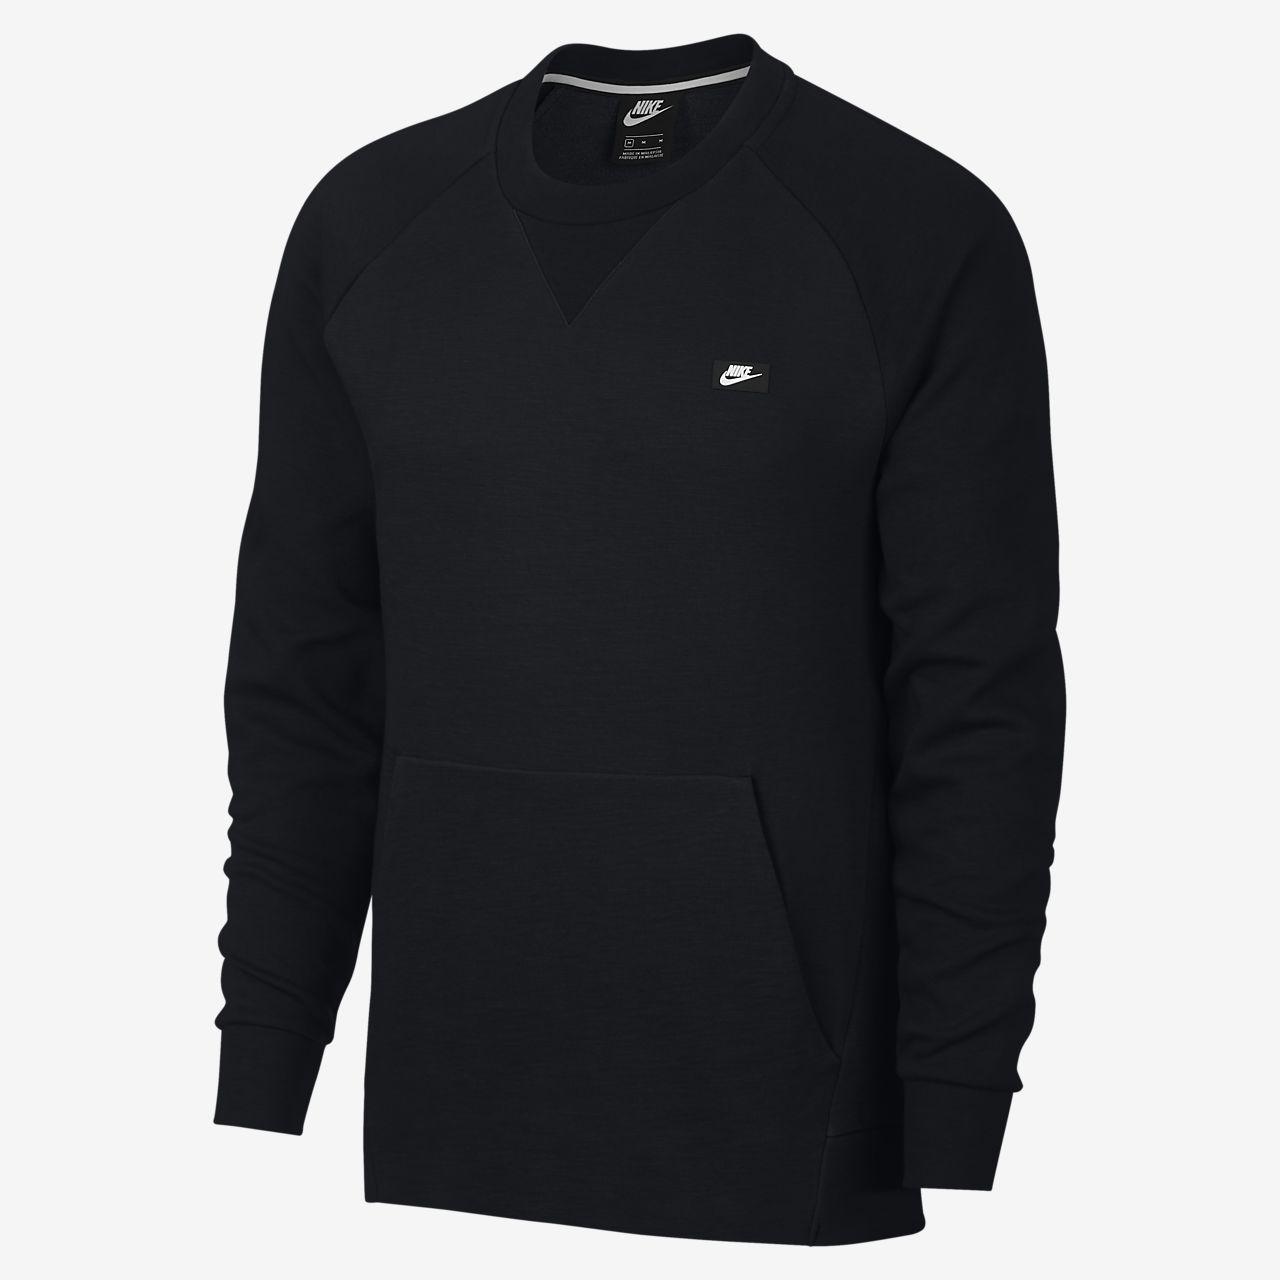 Haut Nike Sportswear Optic pour Homme